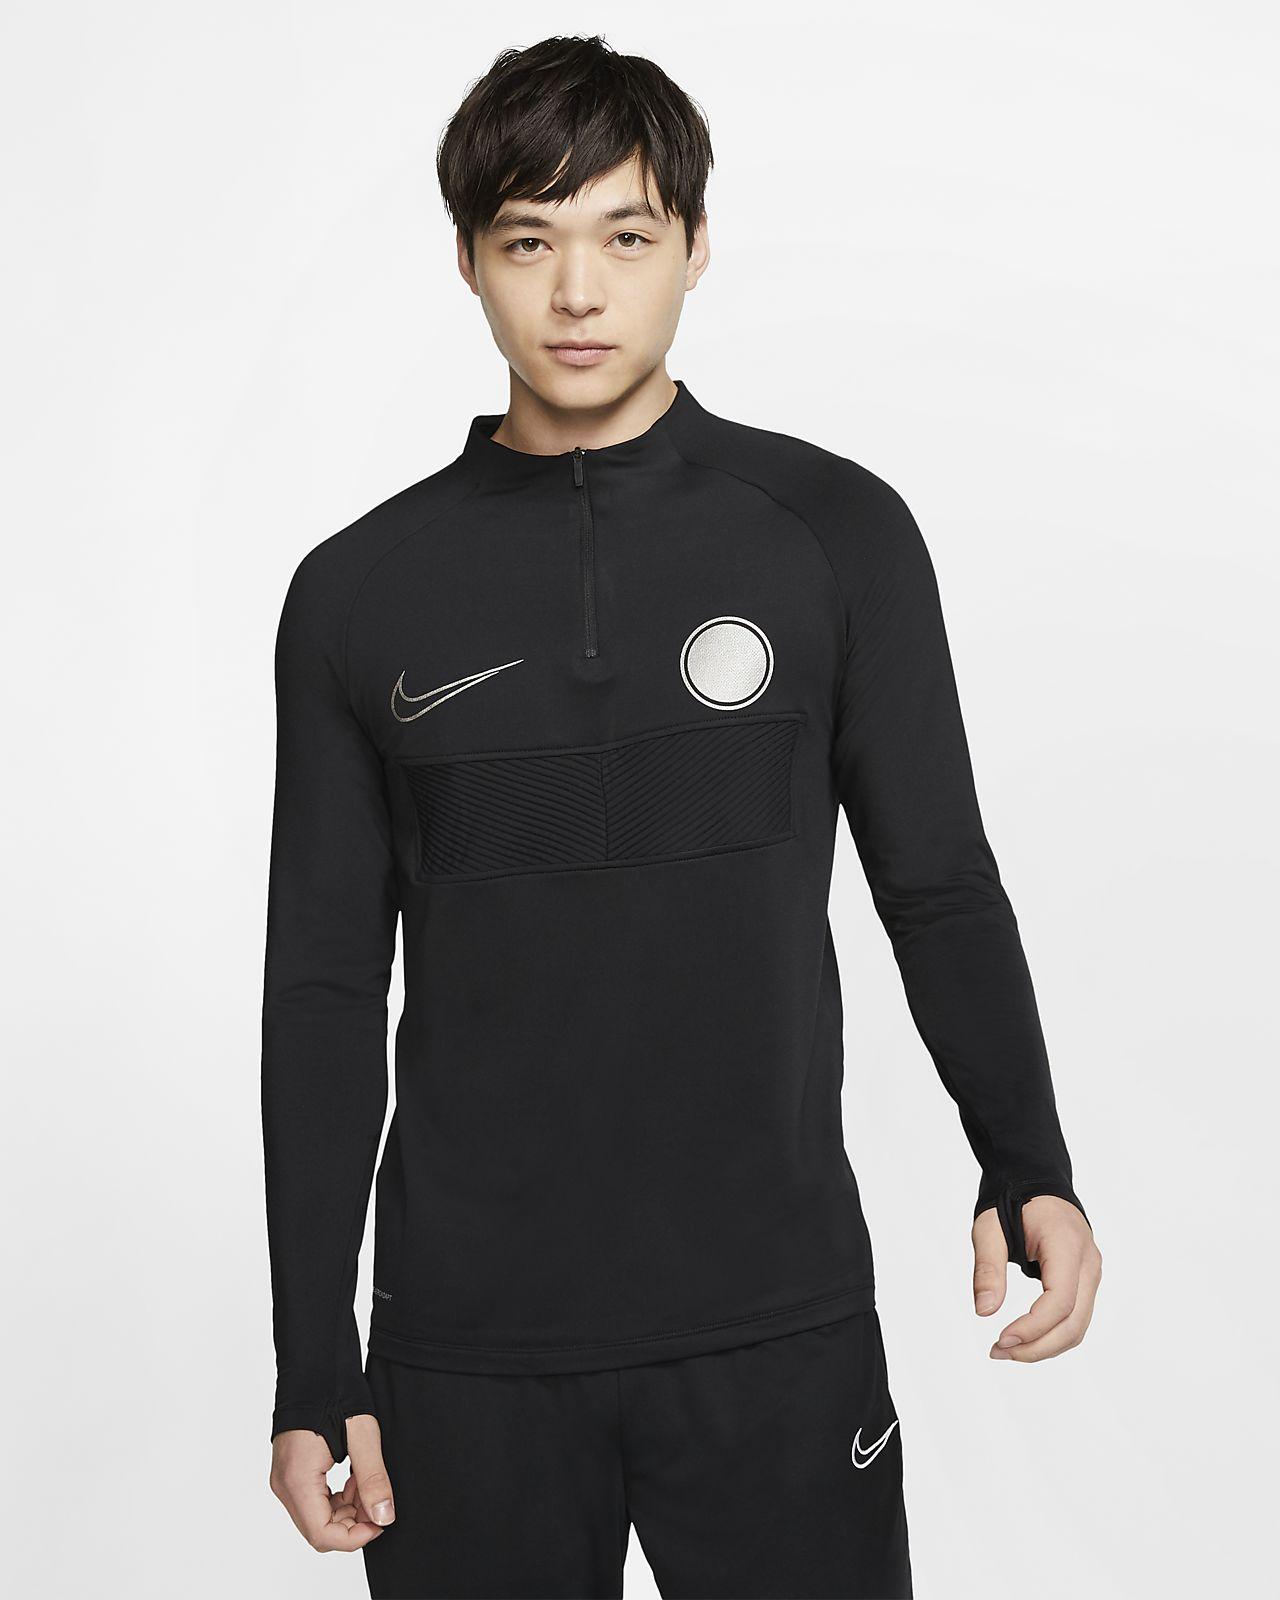 Nike AeroAdapt Strike Erkek Futbol Antrenman Üstü